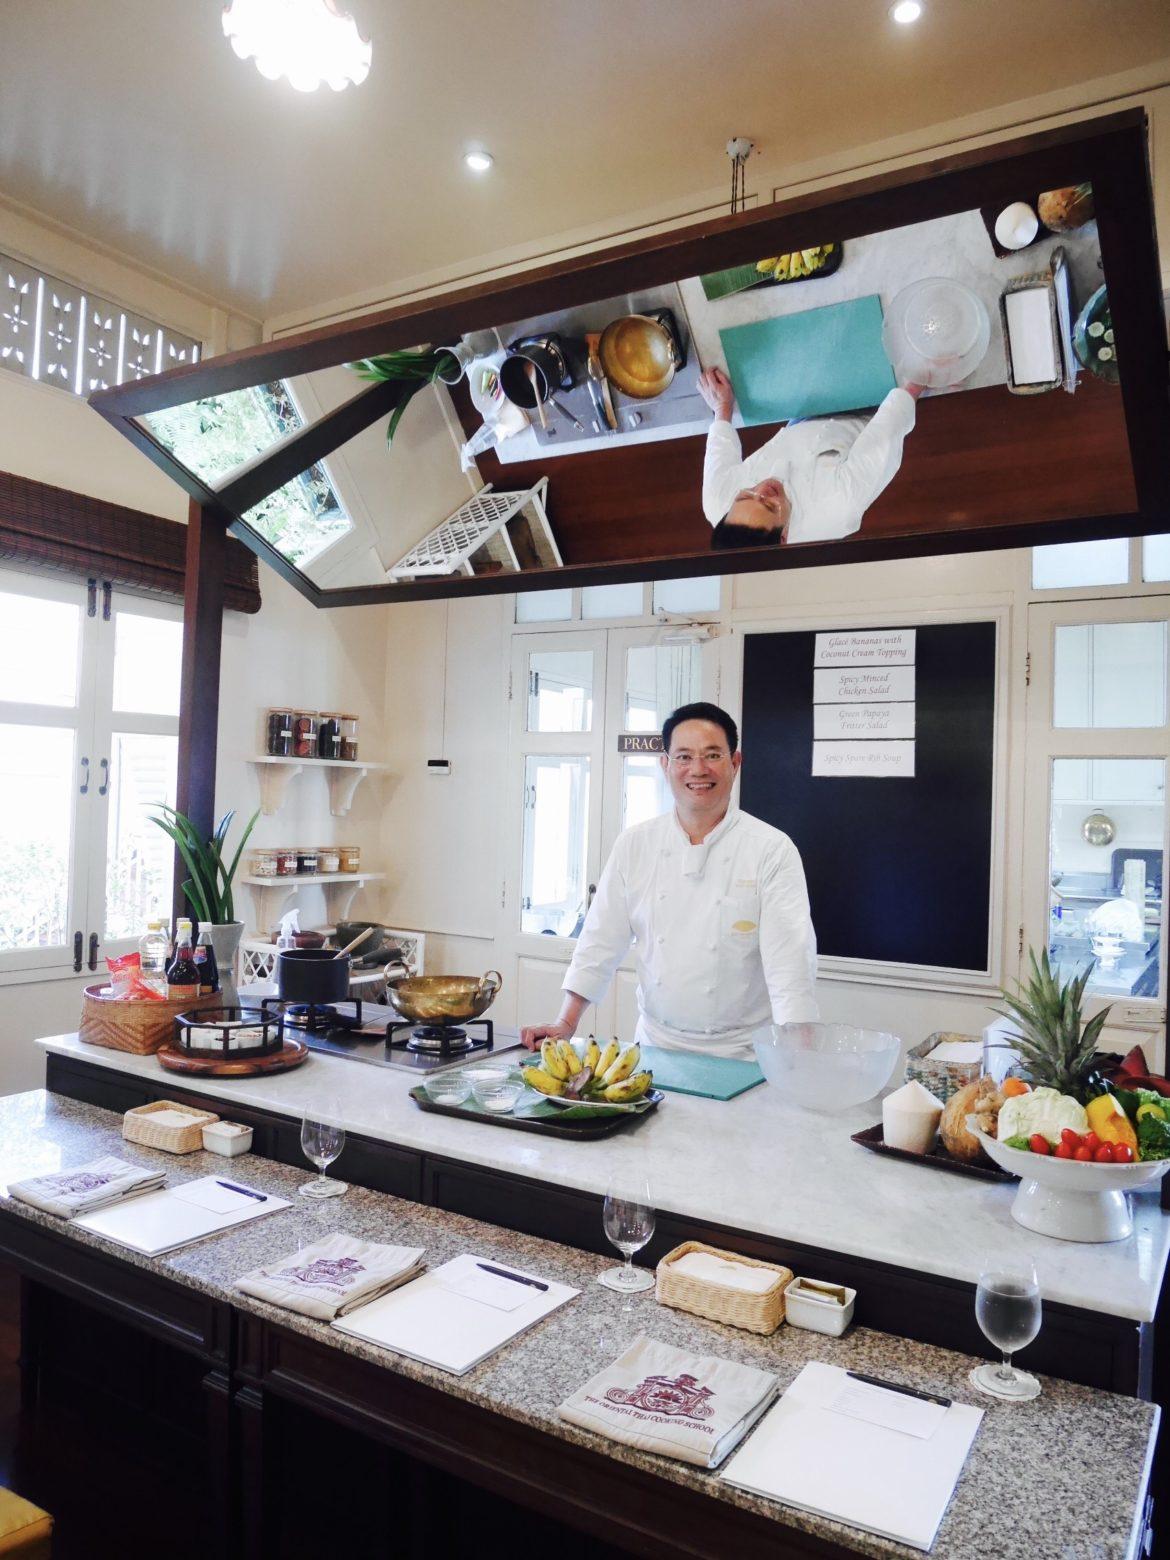 img 9104 1 1170x1560 - The Oriental Thai Cooking School - マンダリンオリエンタルバンコクのおもてなし空間で体験する絶品タイ料理教室